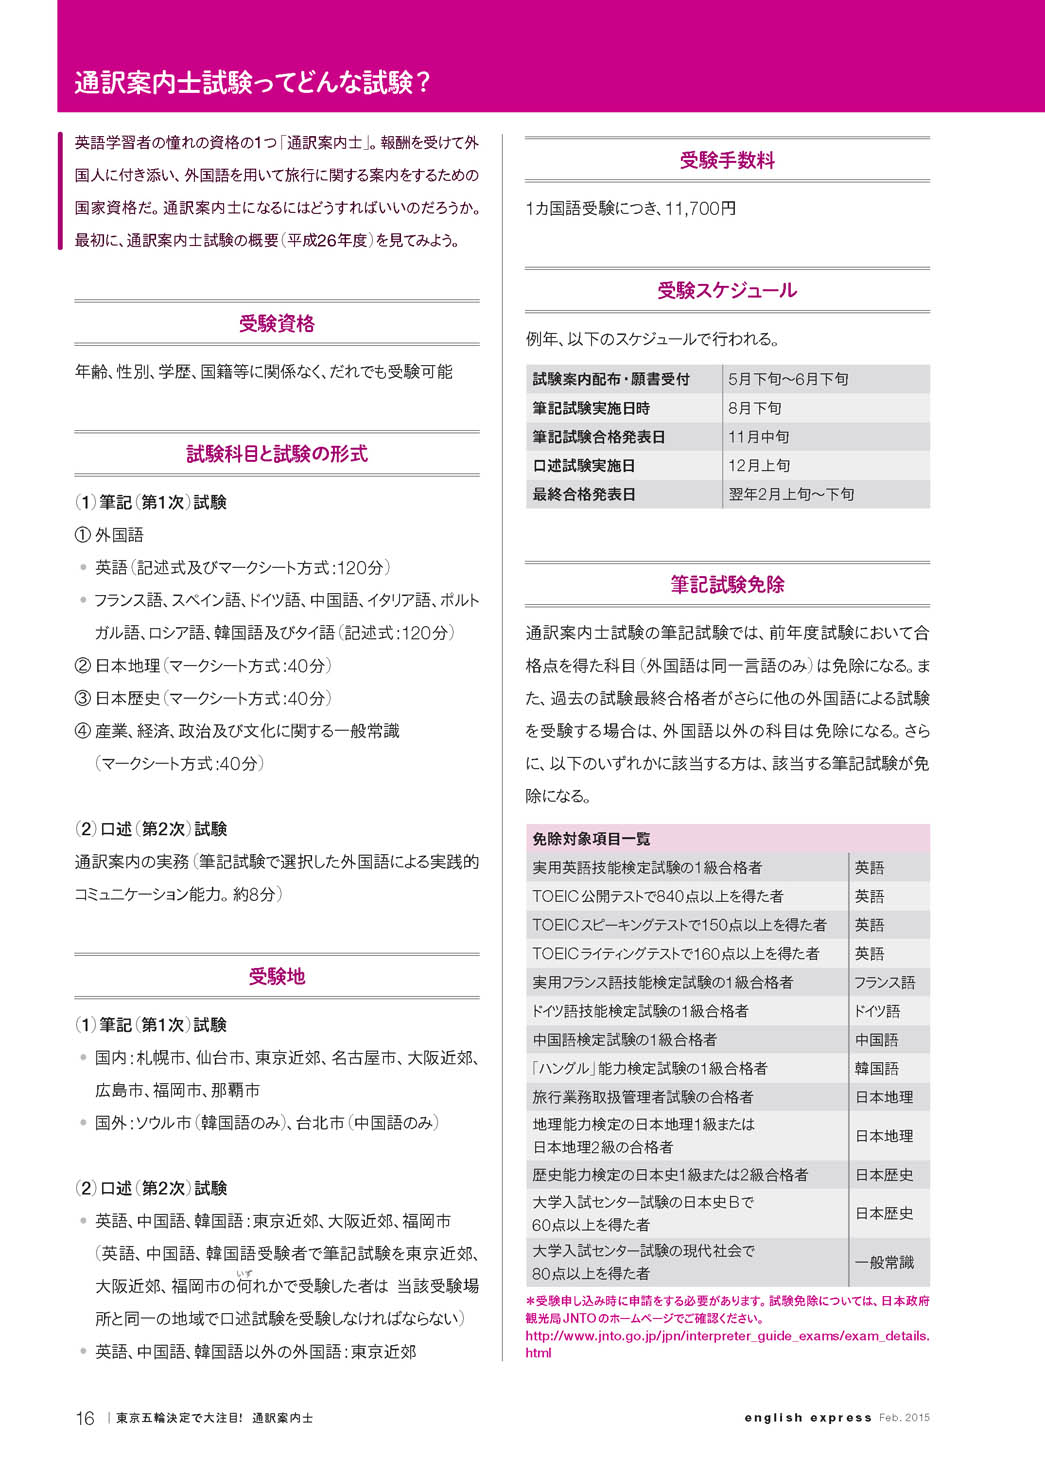 ◆FOCUS#br#東京五輪決定で大注目!#br#通訳案内士